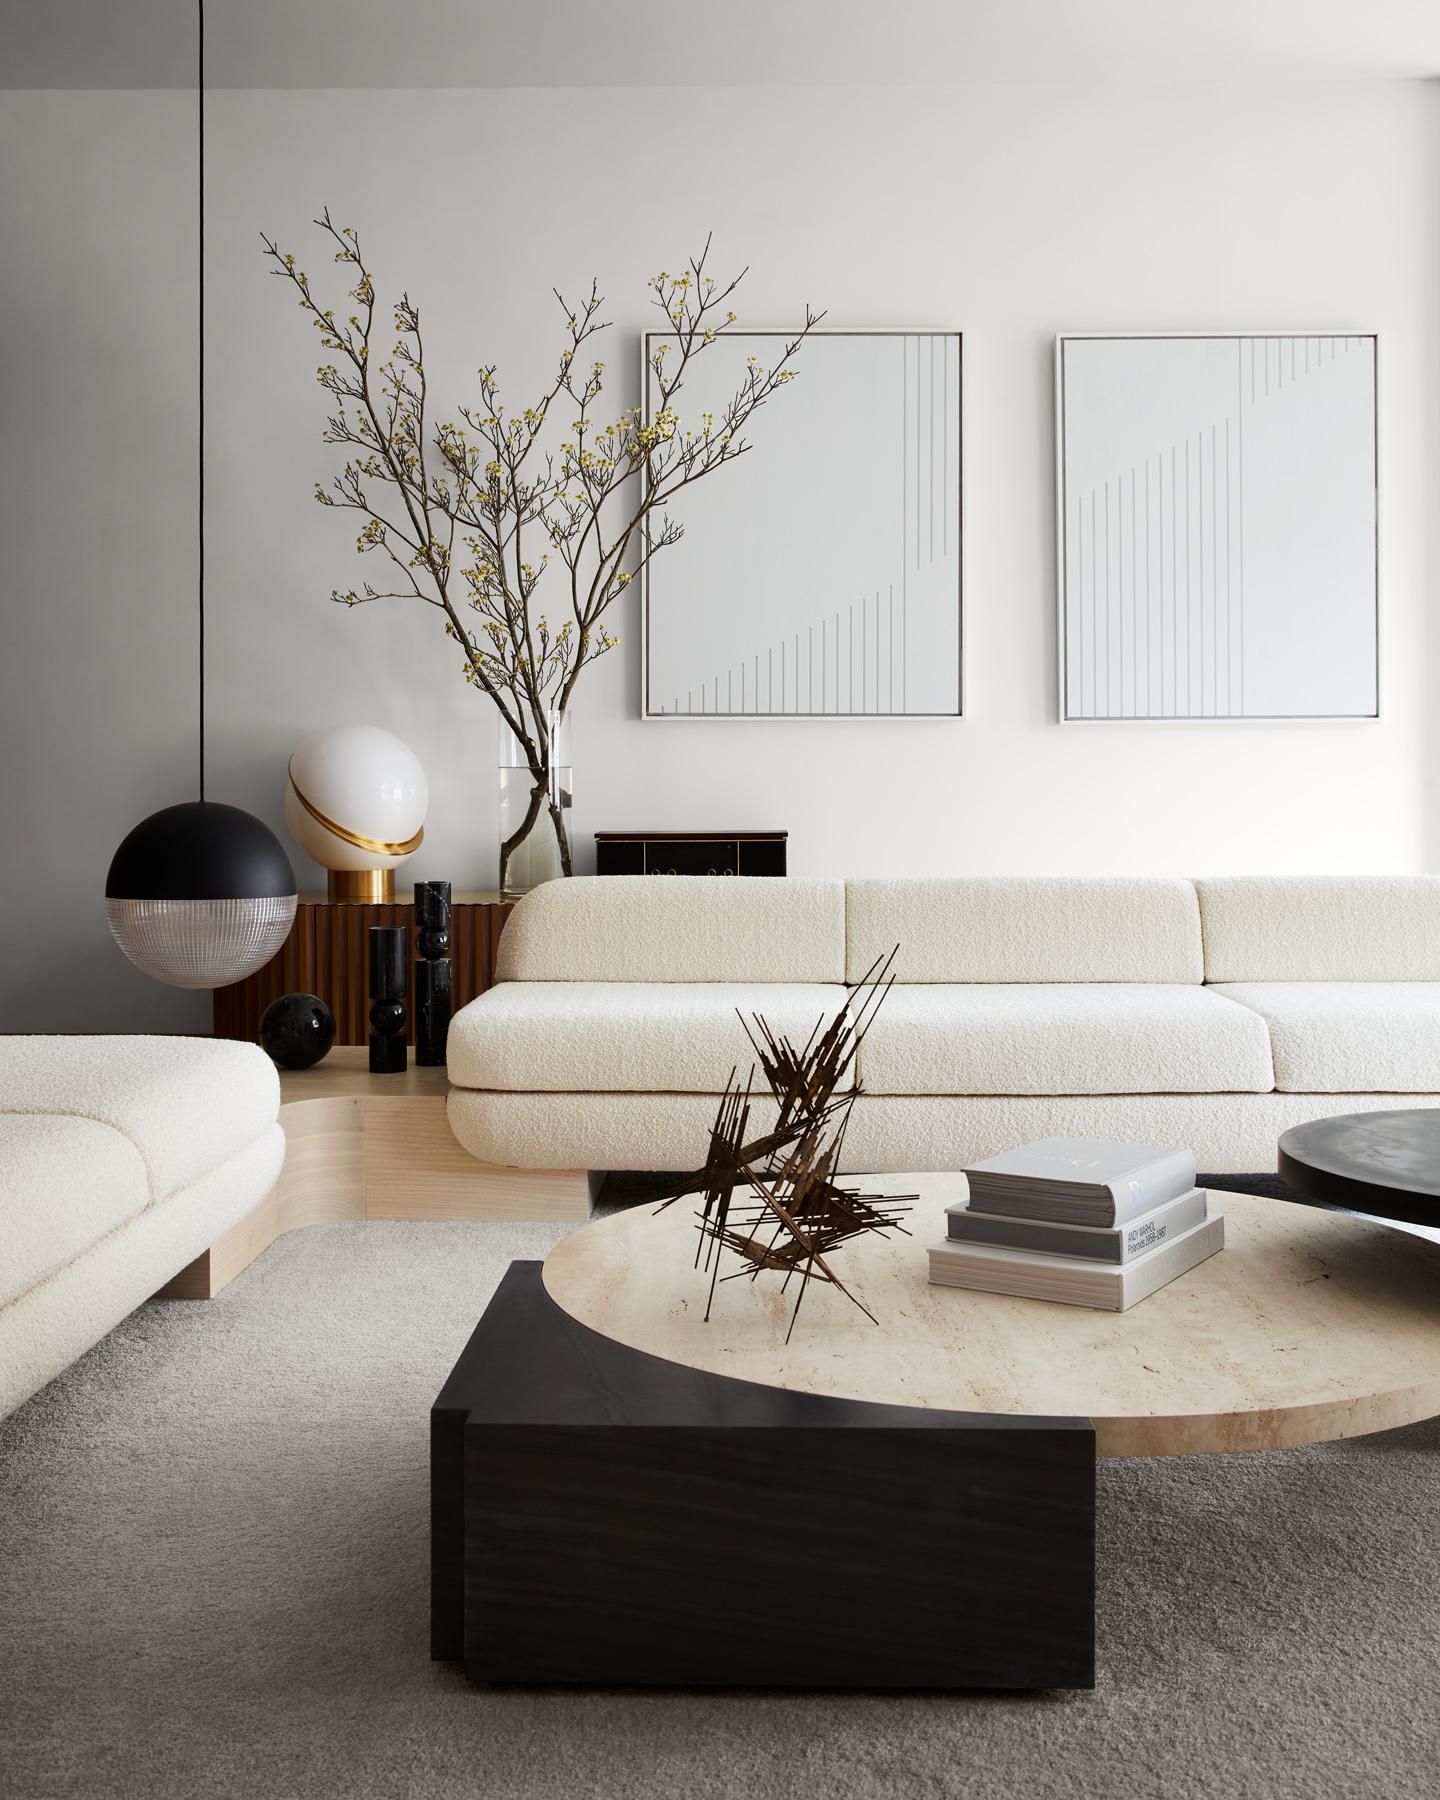 Lee Broom Penthouse New York Living Room Photo Stephen Kent Johnson Yellowtrace 01